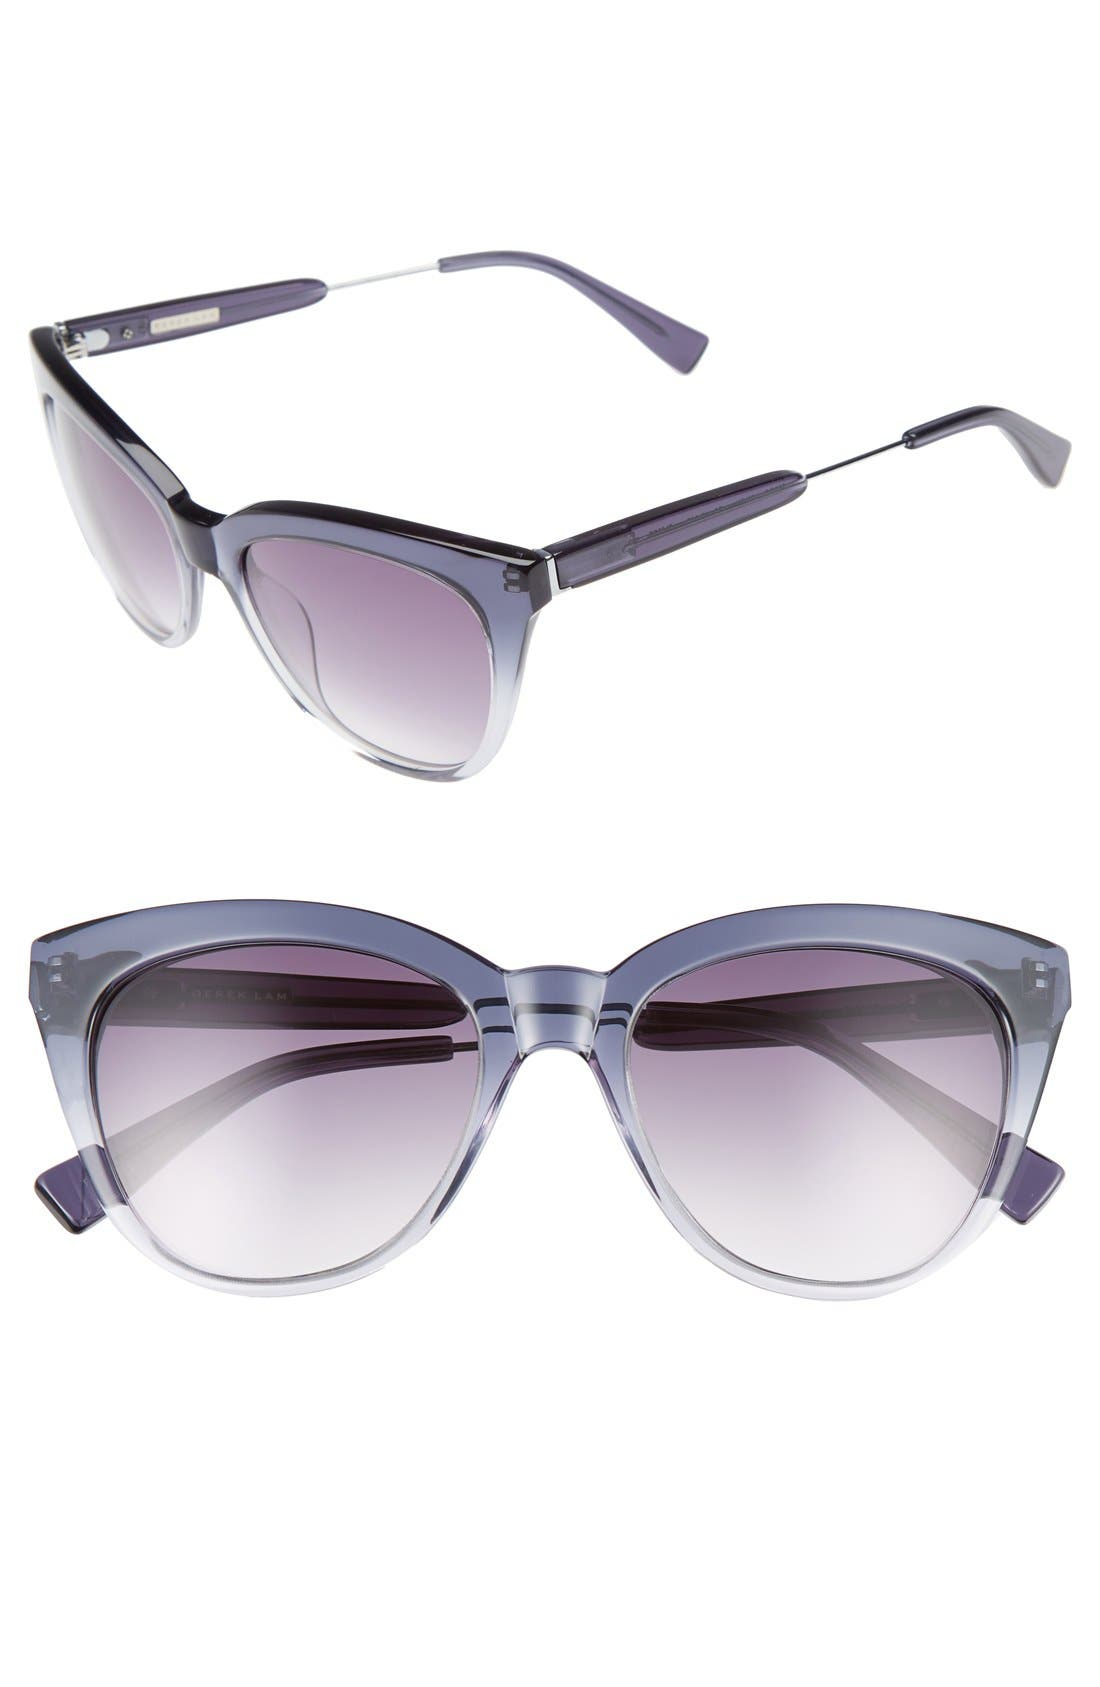 Alternate Image 1 Selected - Derek Lam 'Lenox' 53mm Cat Eye Sunglasses